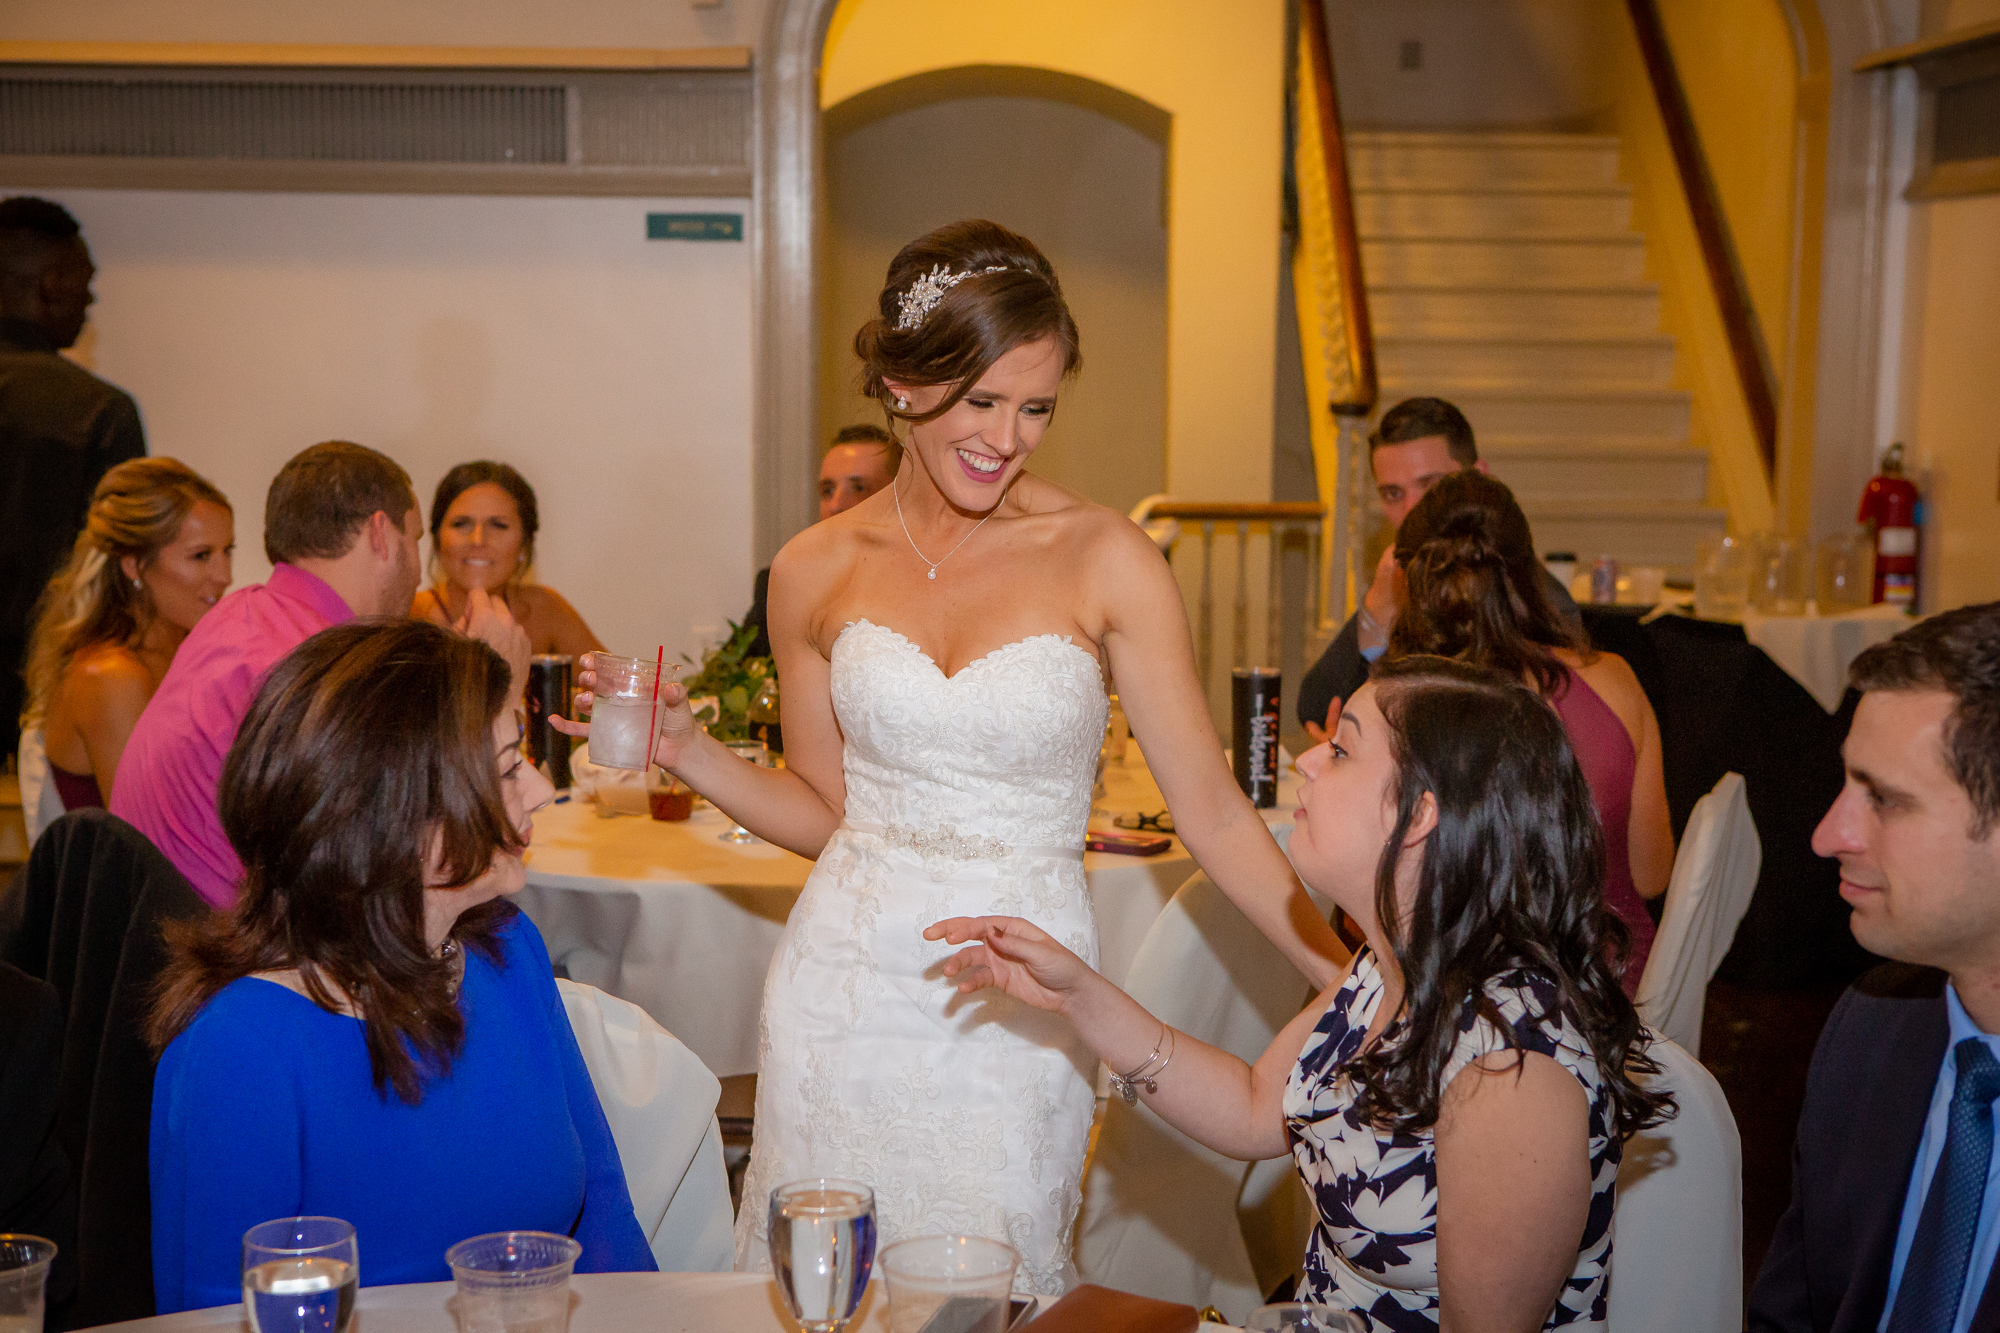 Harro-East-Theatre-and-Ballroom-wedding-8032.jpg